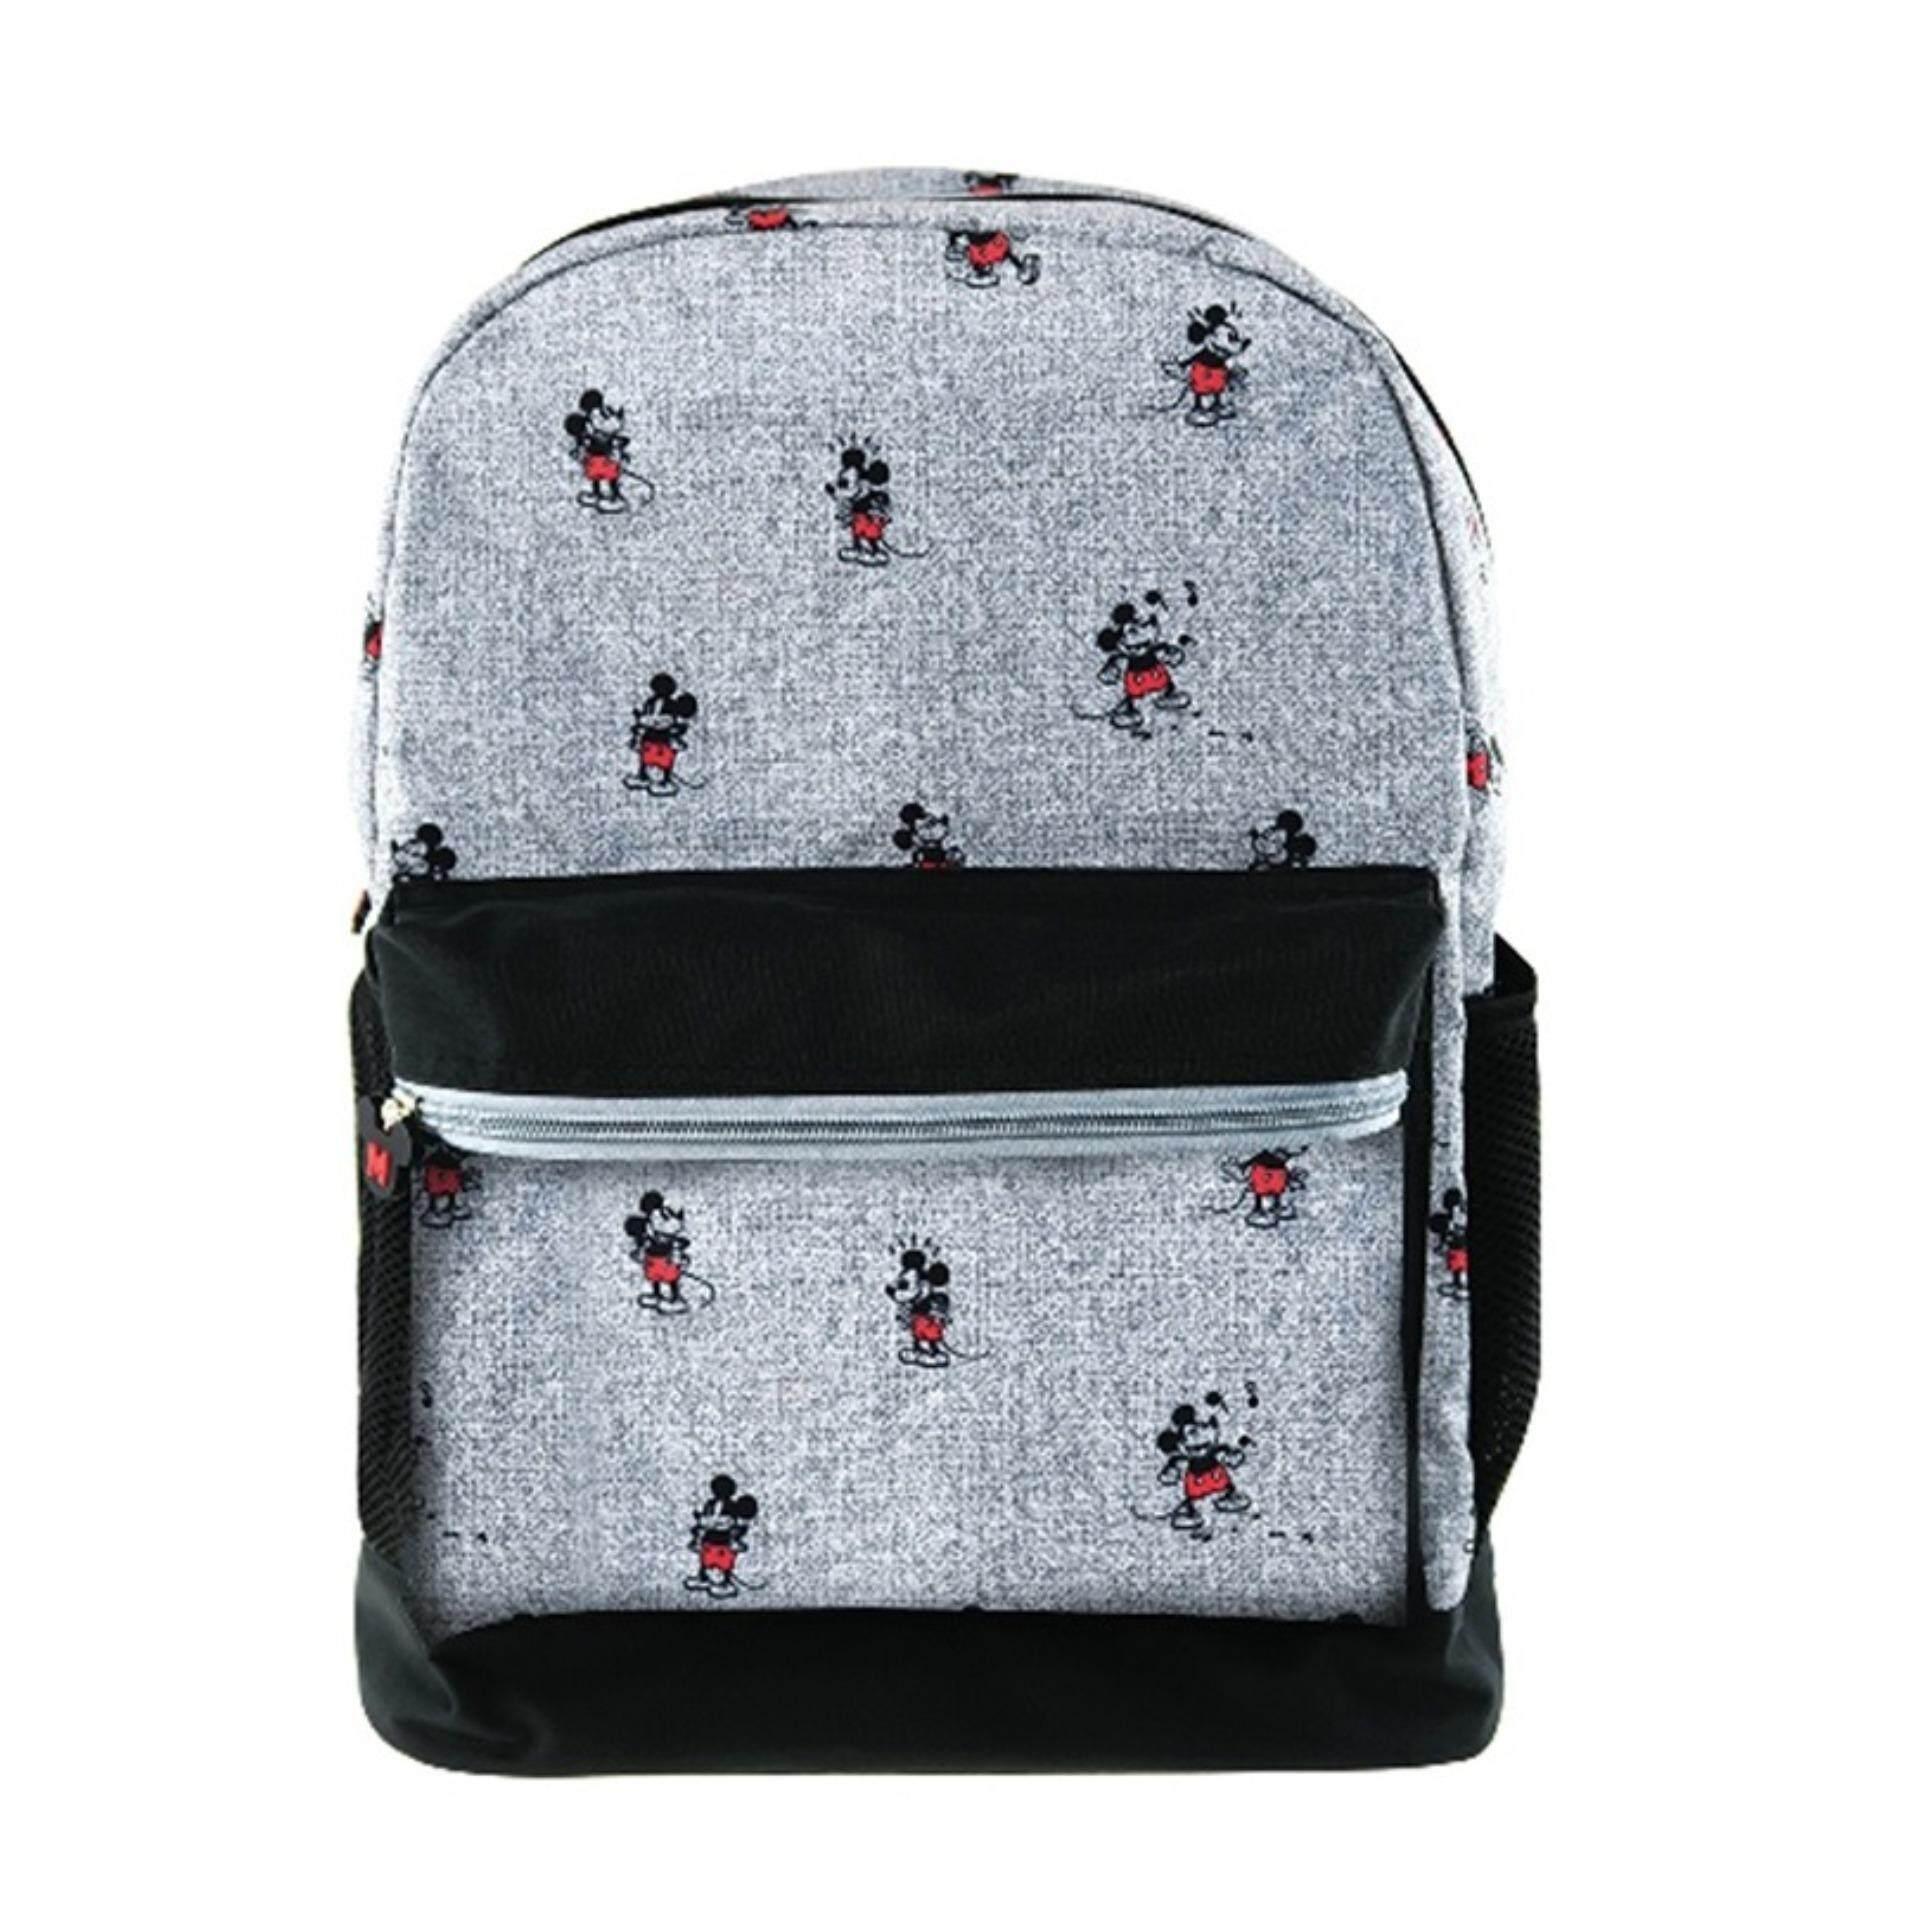 Disney Mickey Retro Teenagers Backpack School Bag - Grey Colour